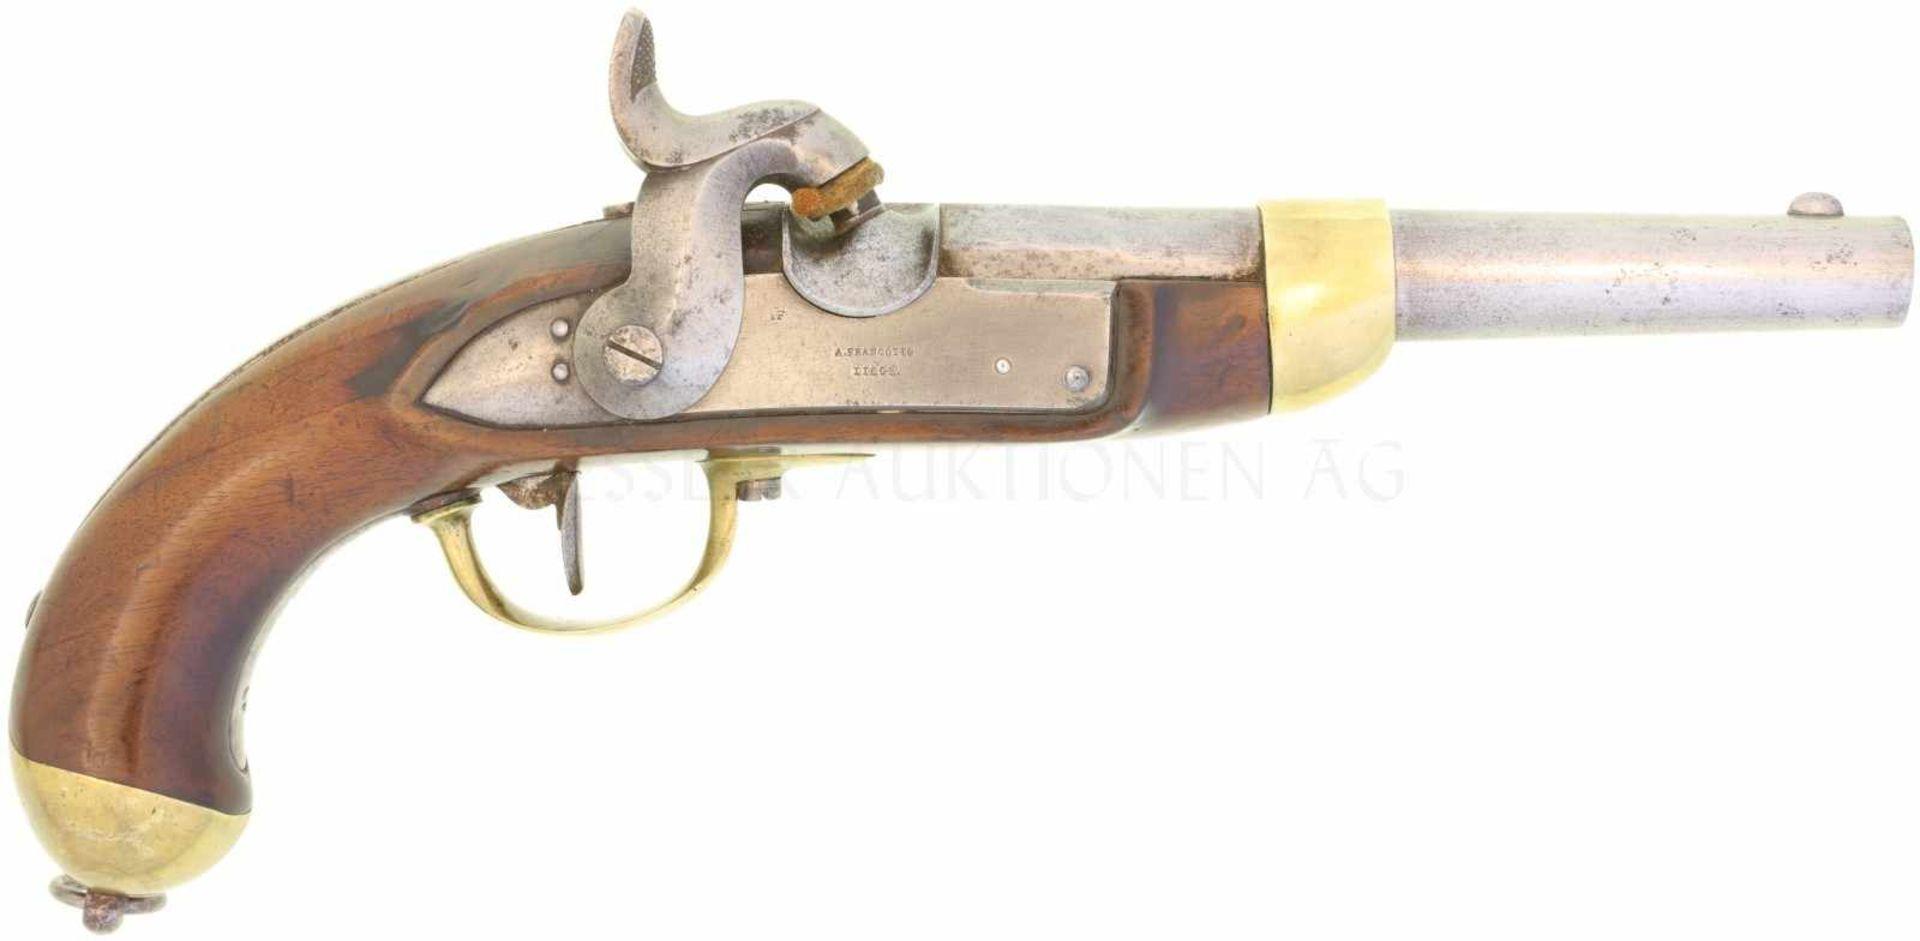 Perkussionspistole, Mod. 1842, Hersteller A. Francotte à Liege. Kal. 17.6mm<